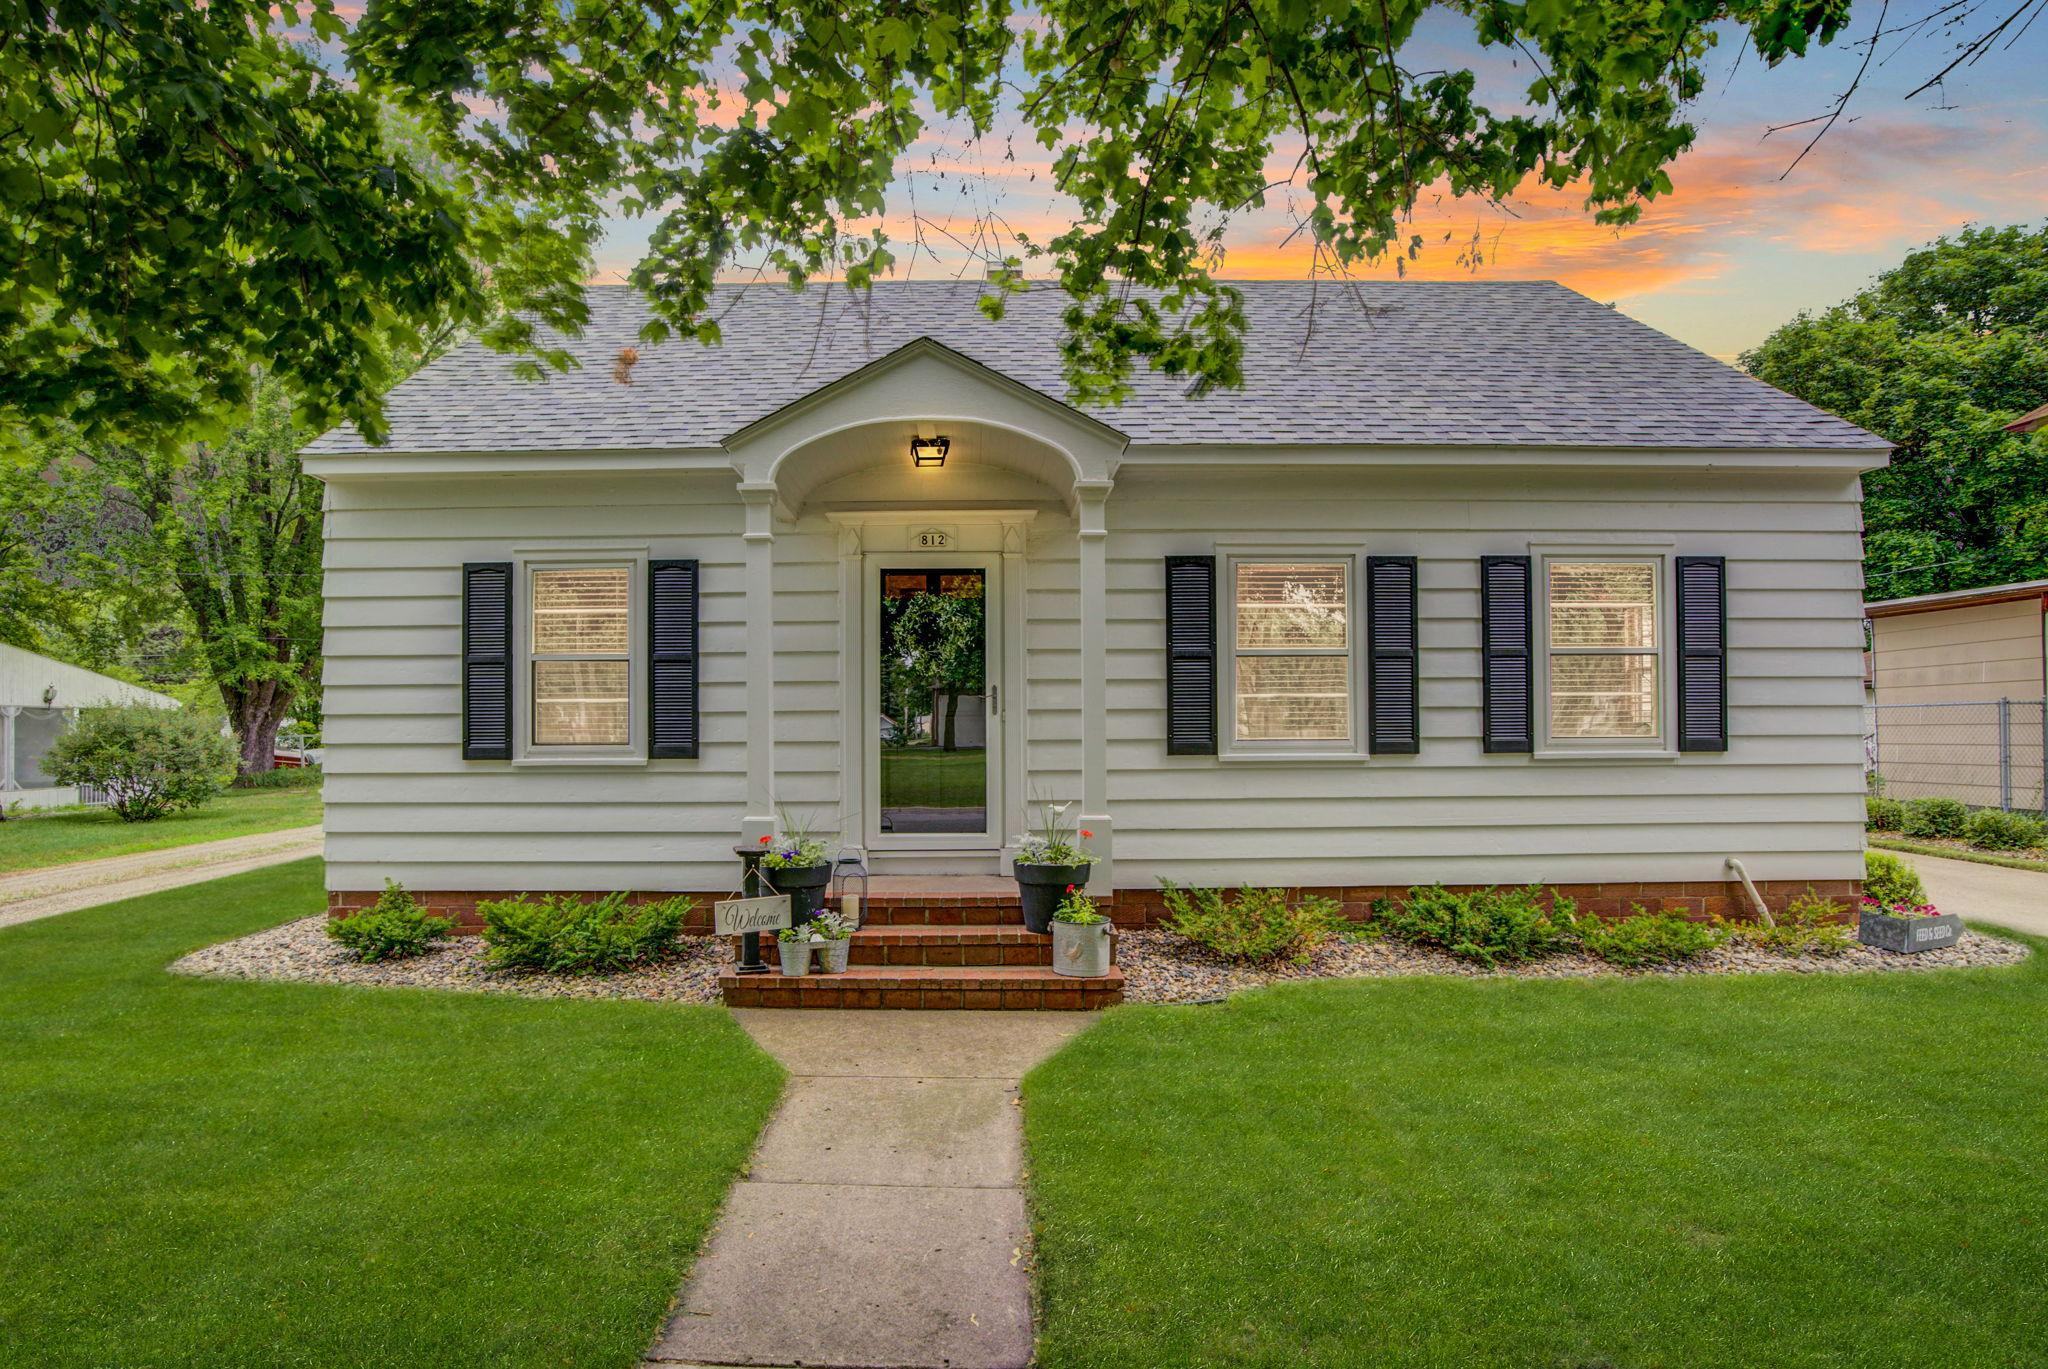 812 Ford N Property Photo - Glencoe, MN real estate listing